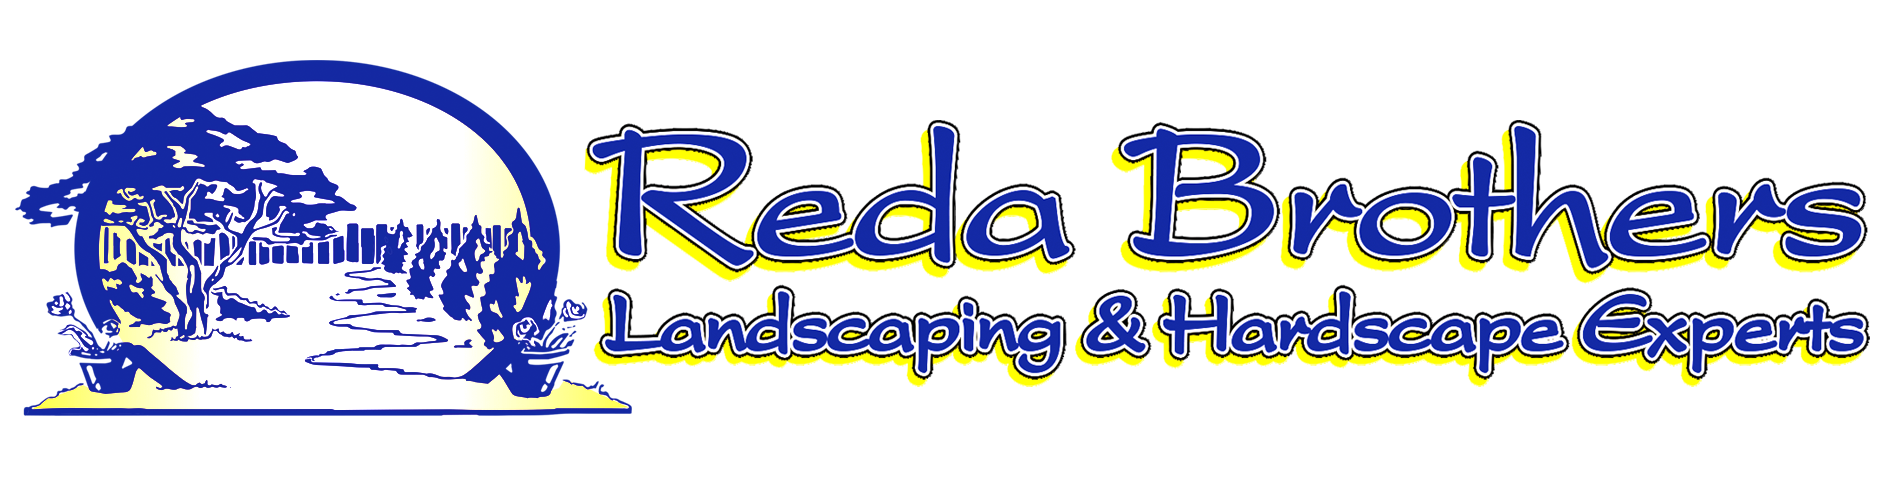 Reda Brothers